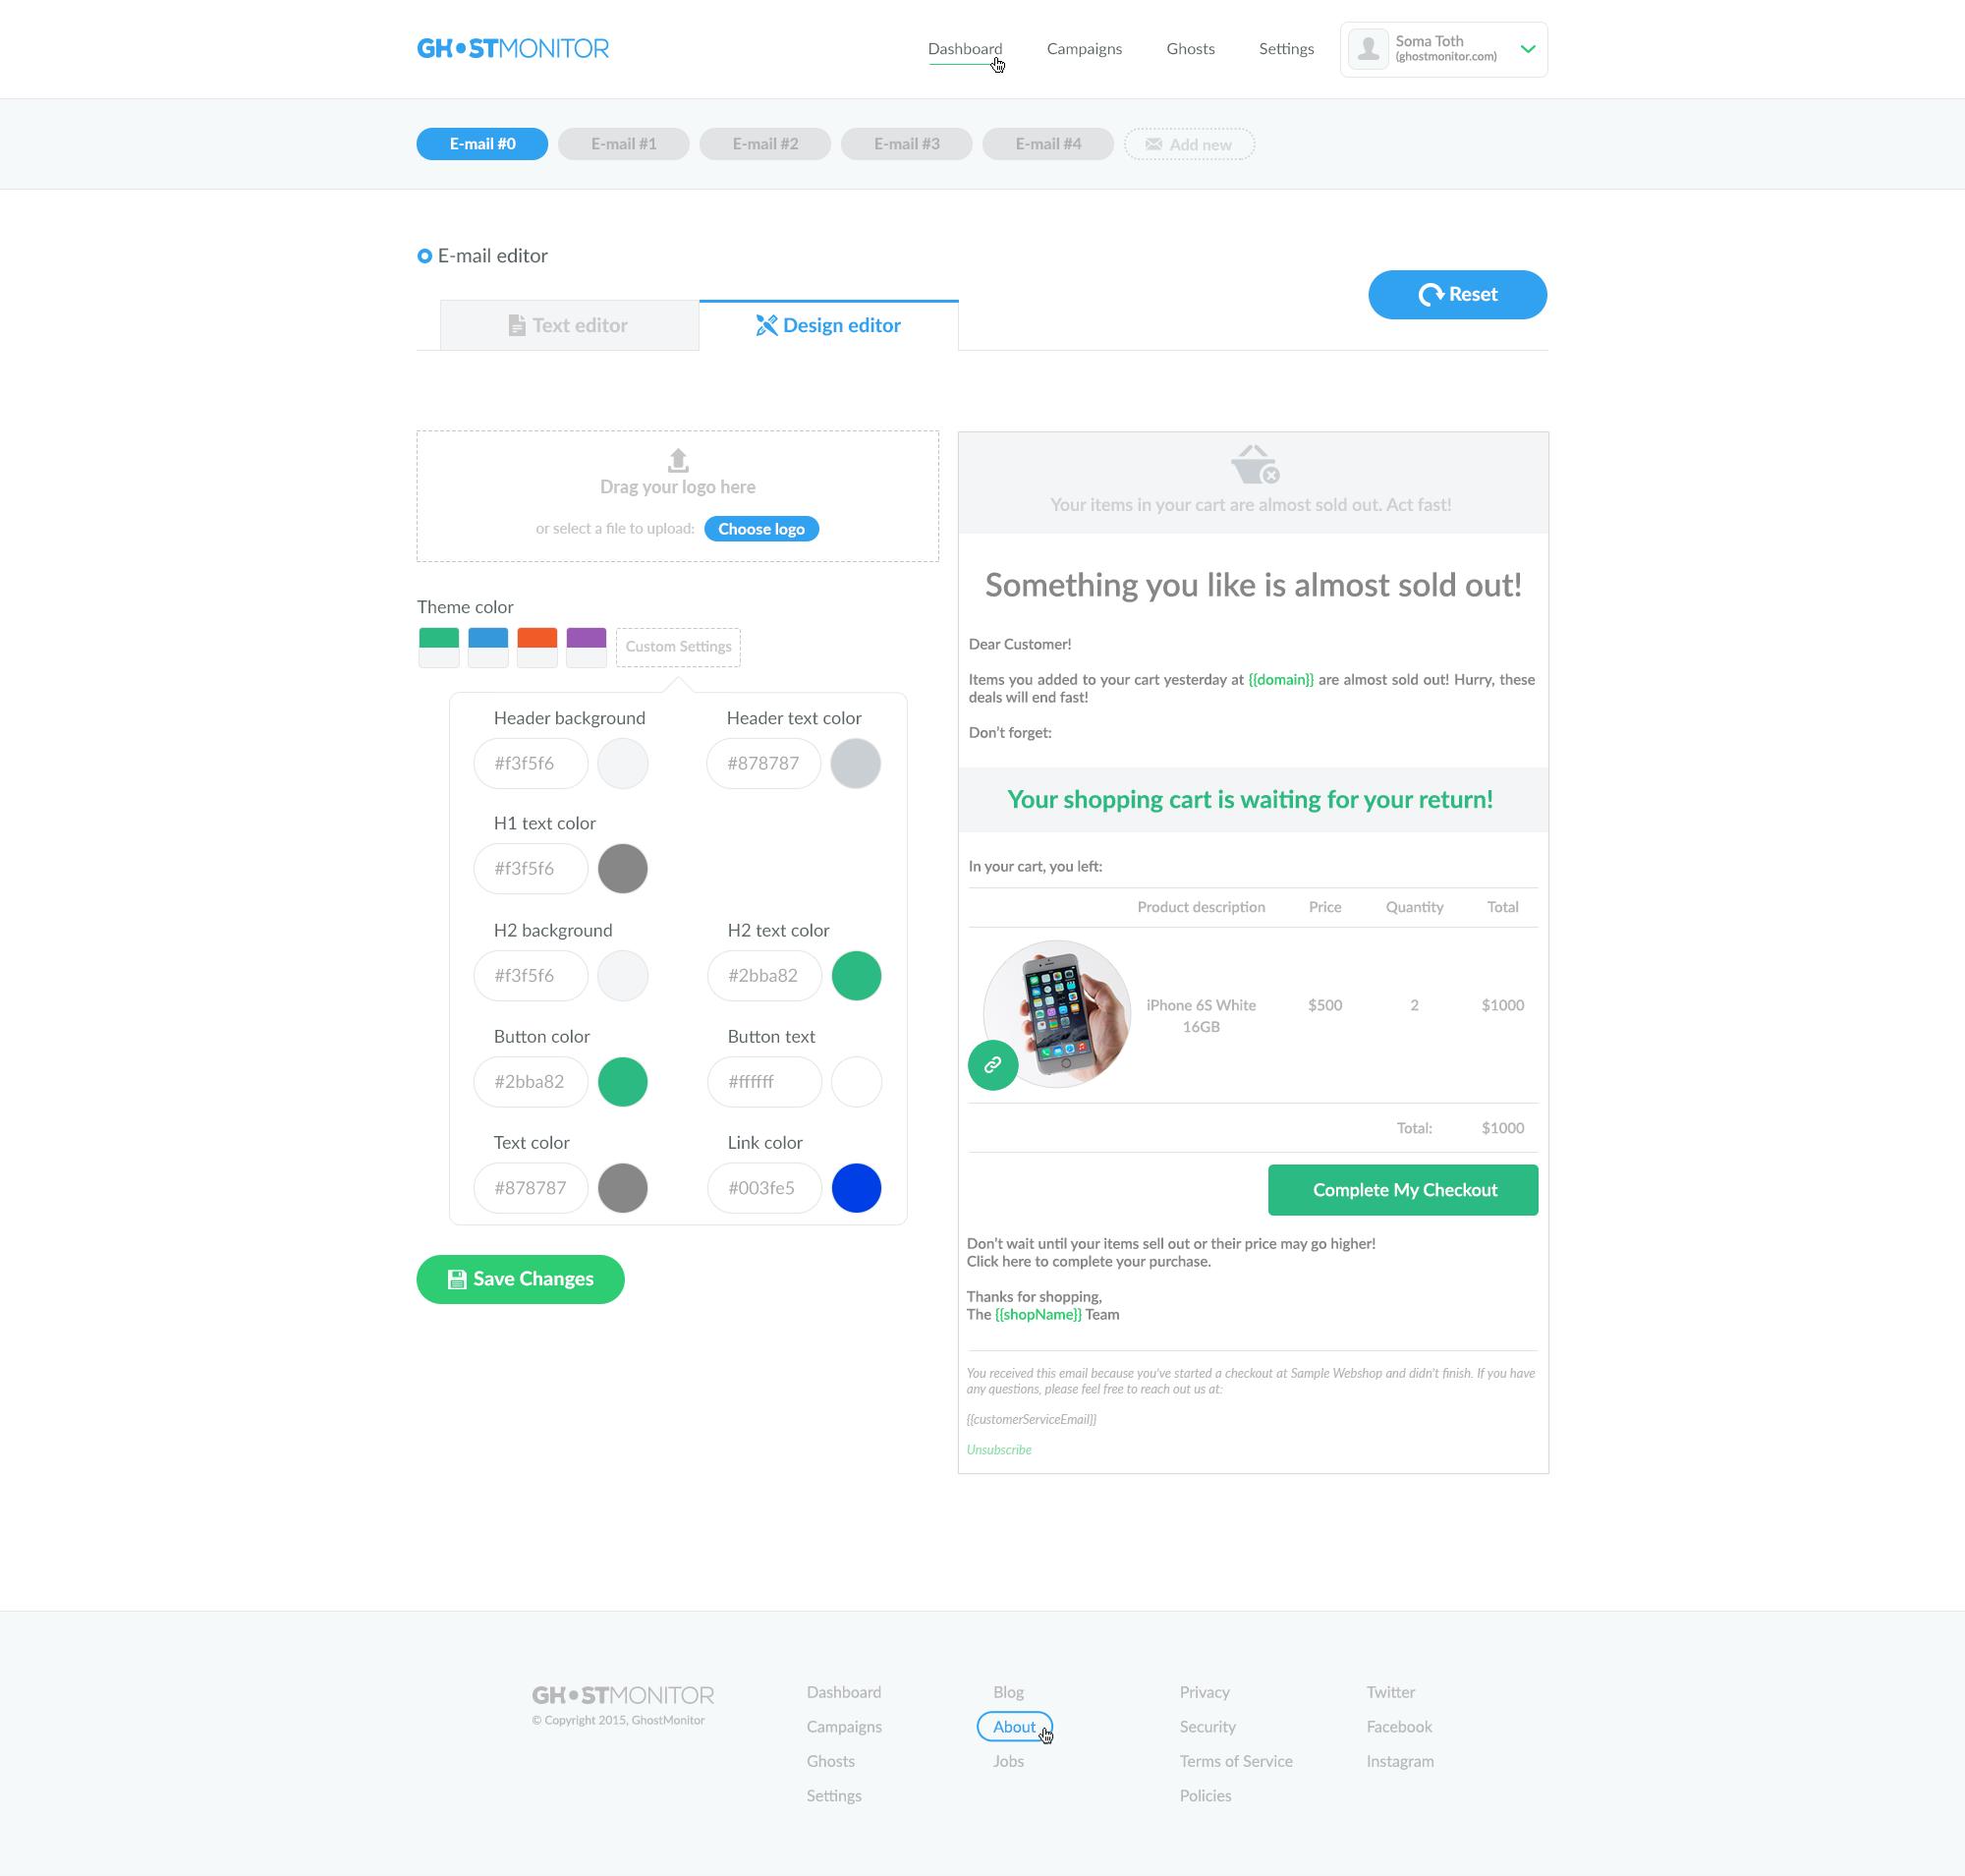 Email Editor design